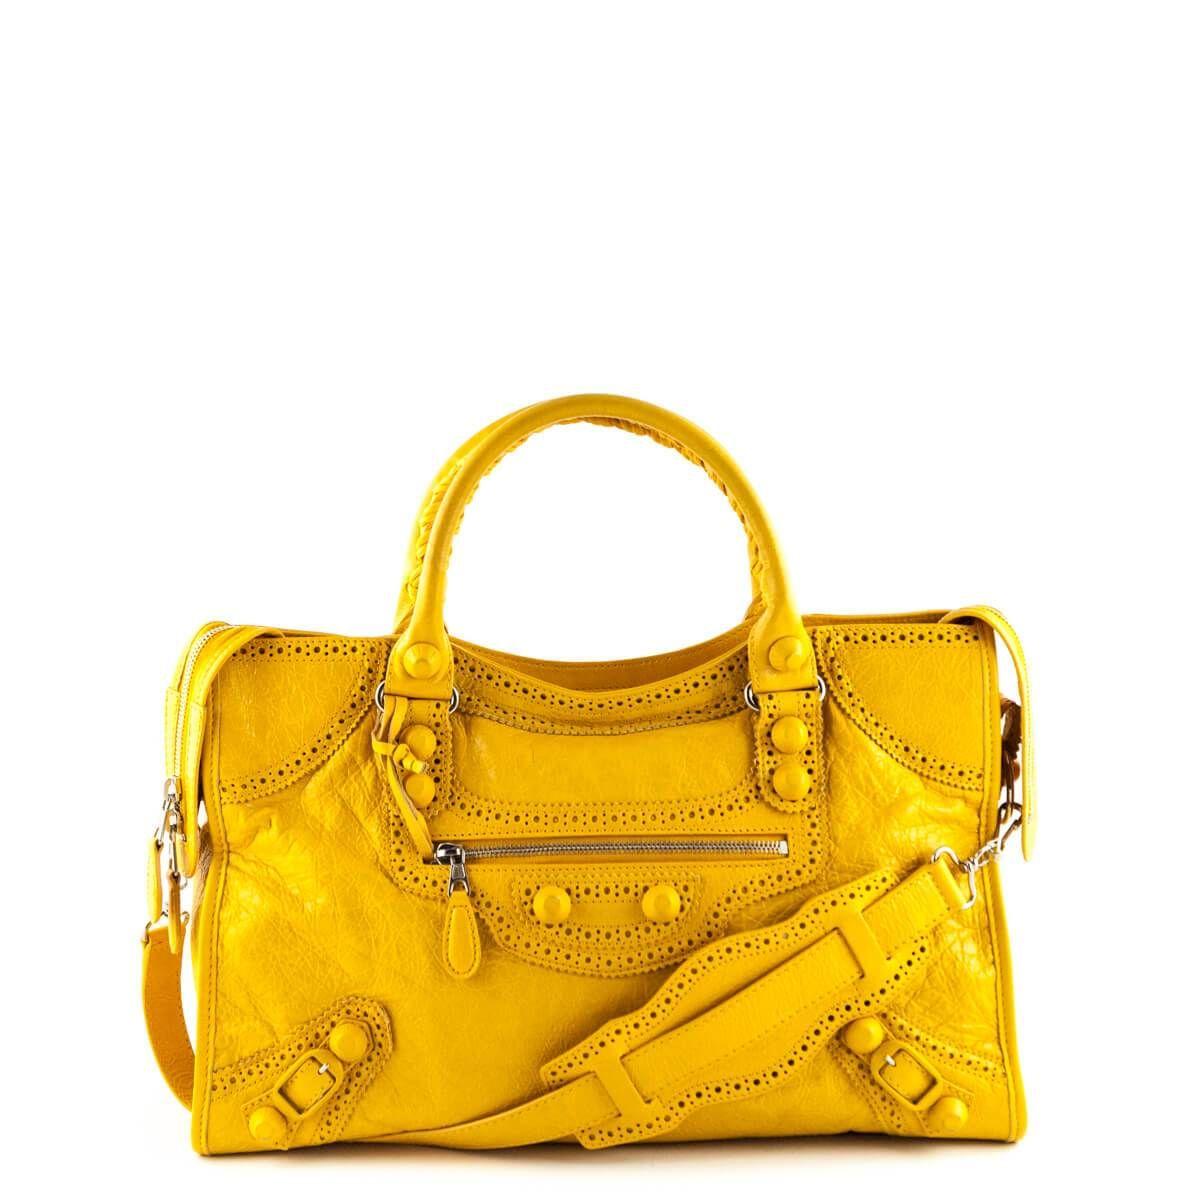 49d436756070 Balenciaga Special Edition Mango Lambskin City Bag - LOVEthatBAG - Preloved  Authentic Designer Handbags -  1375